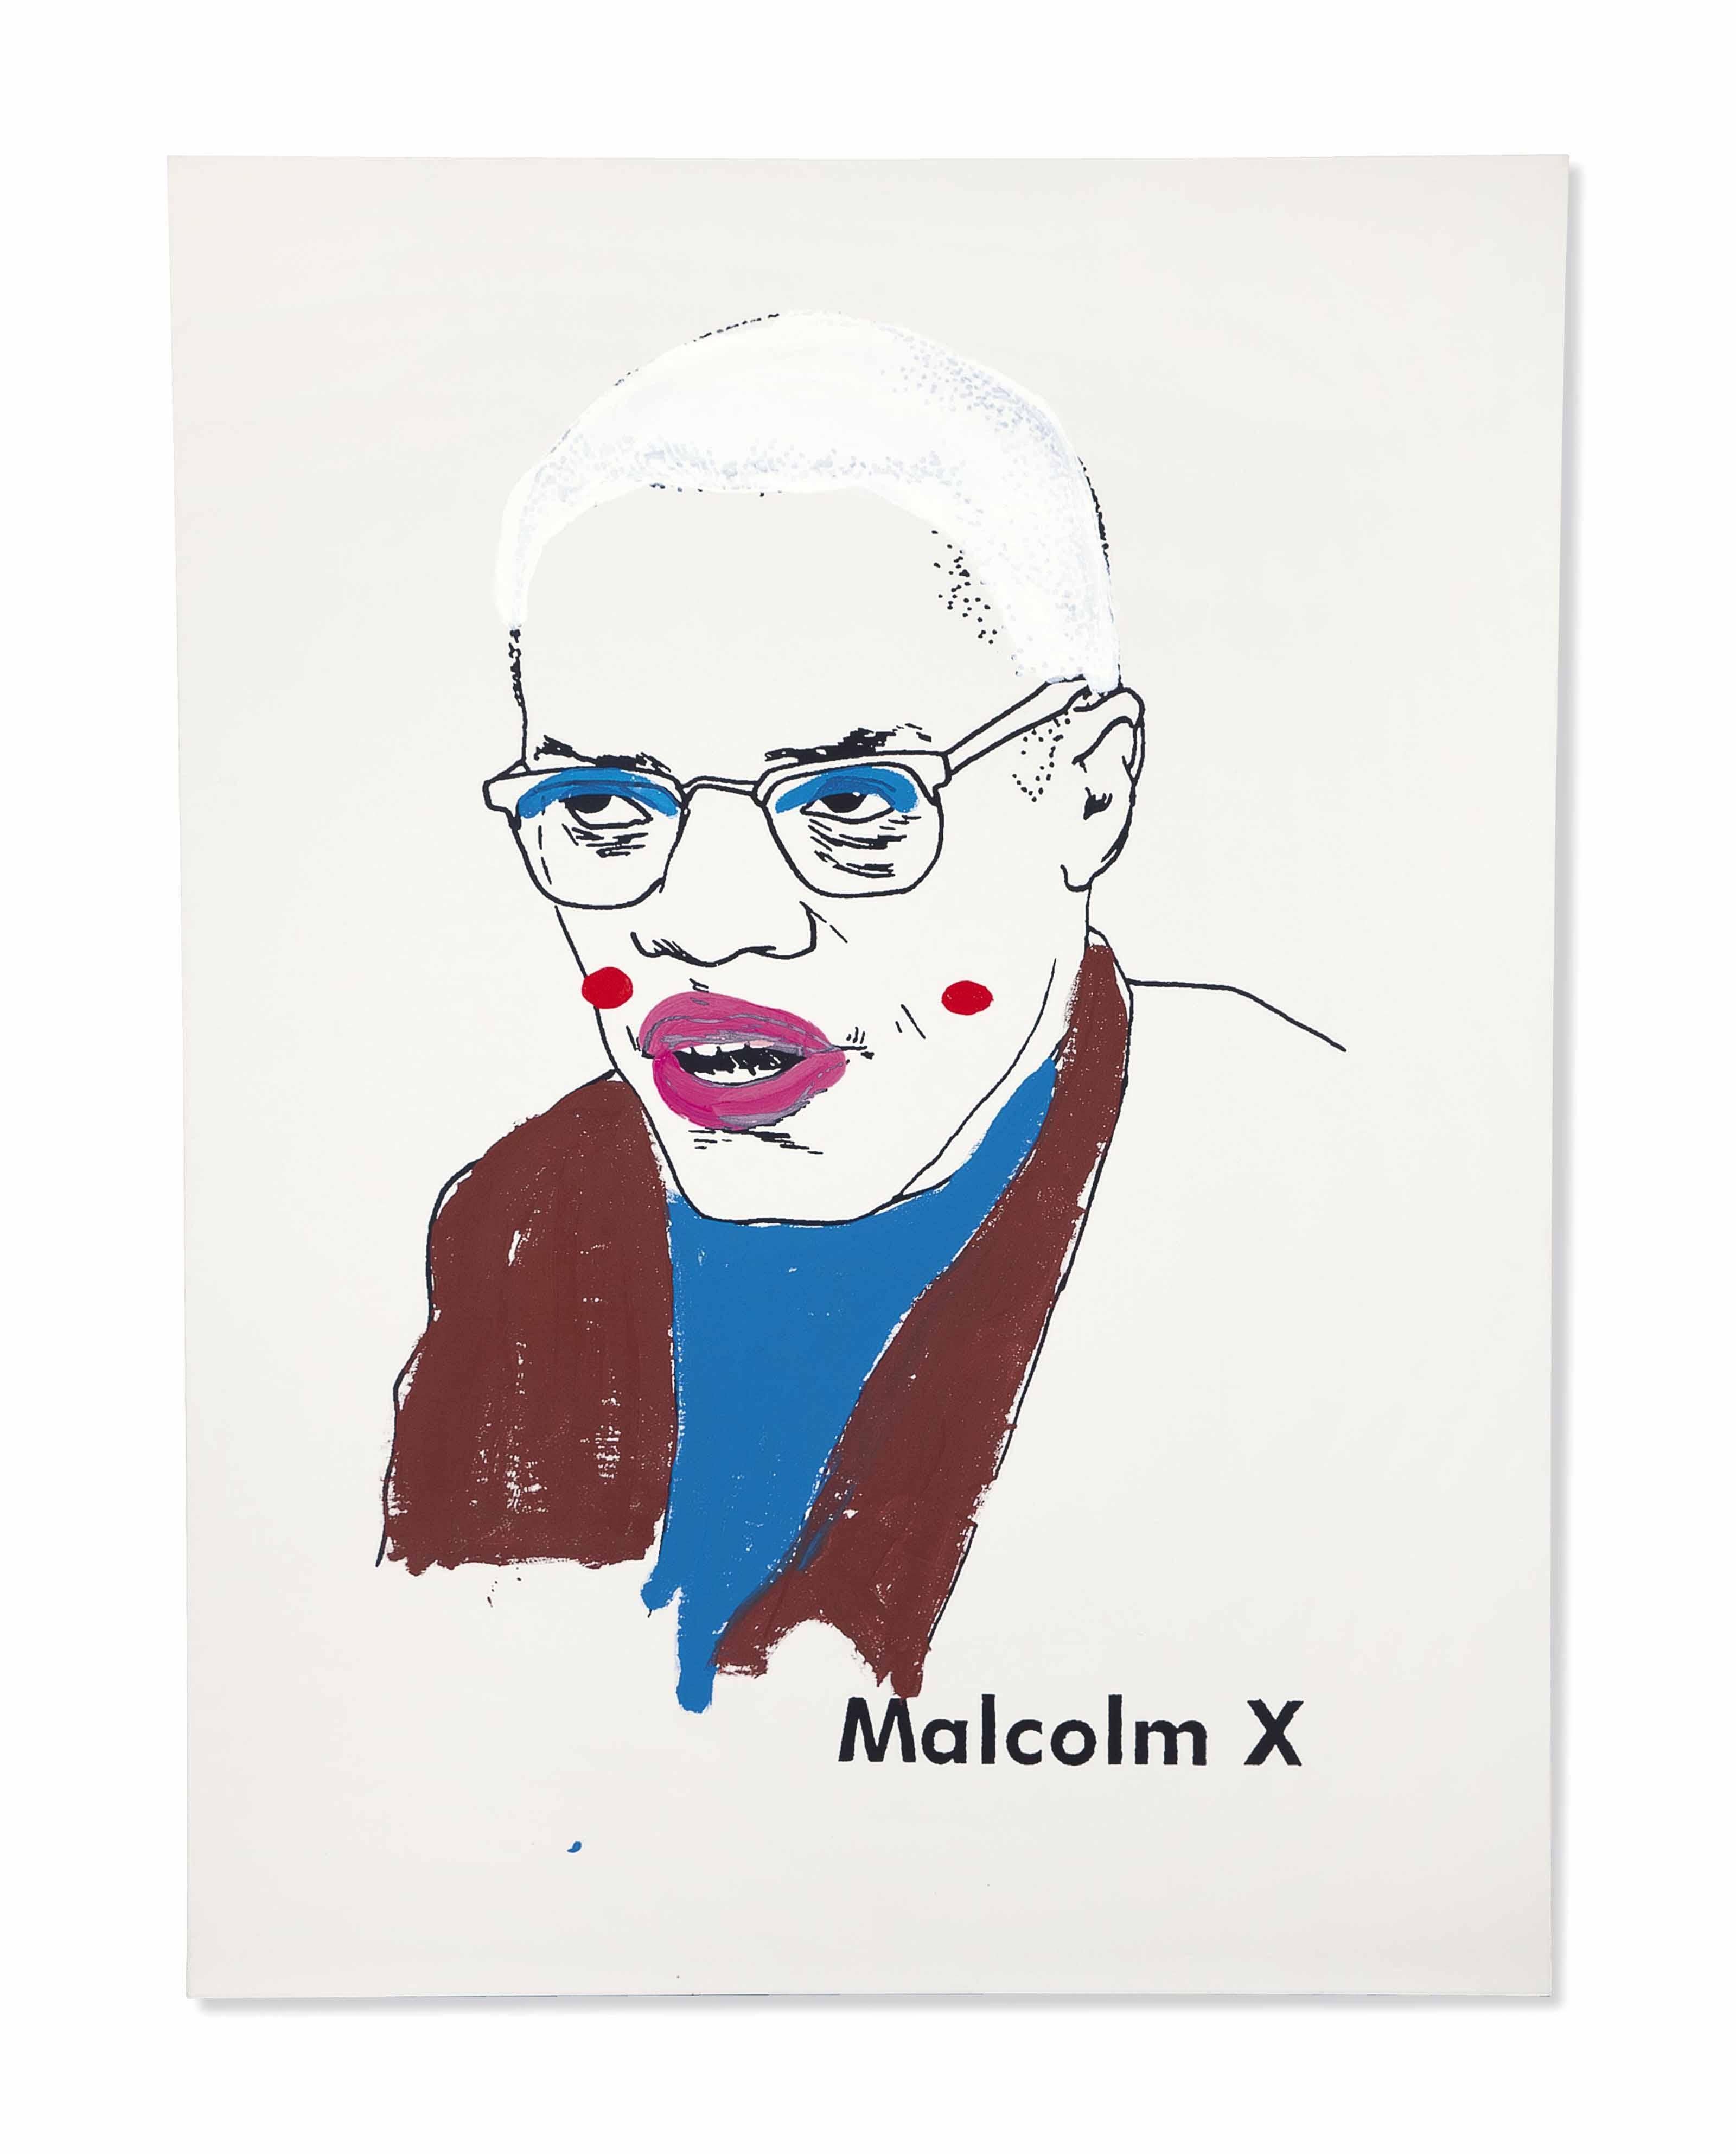 Malcolm X (version 1) #1